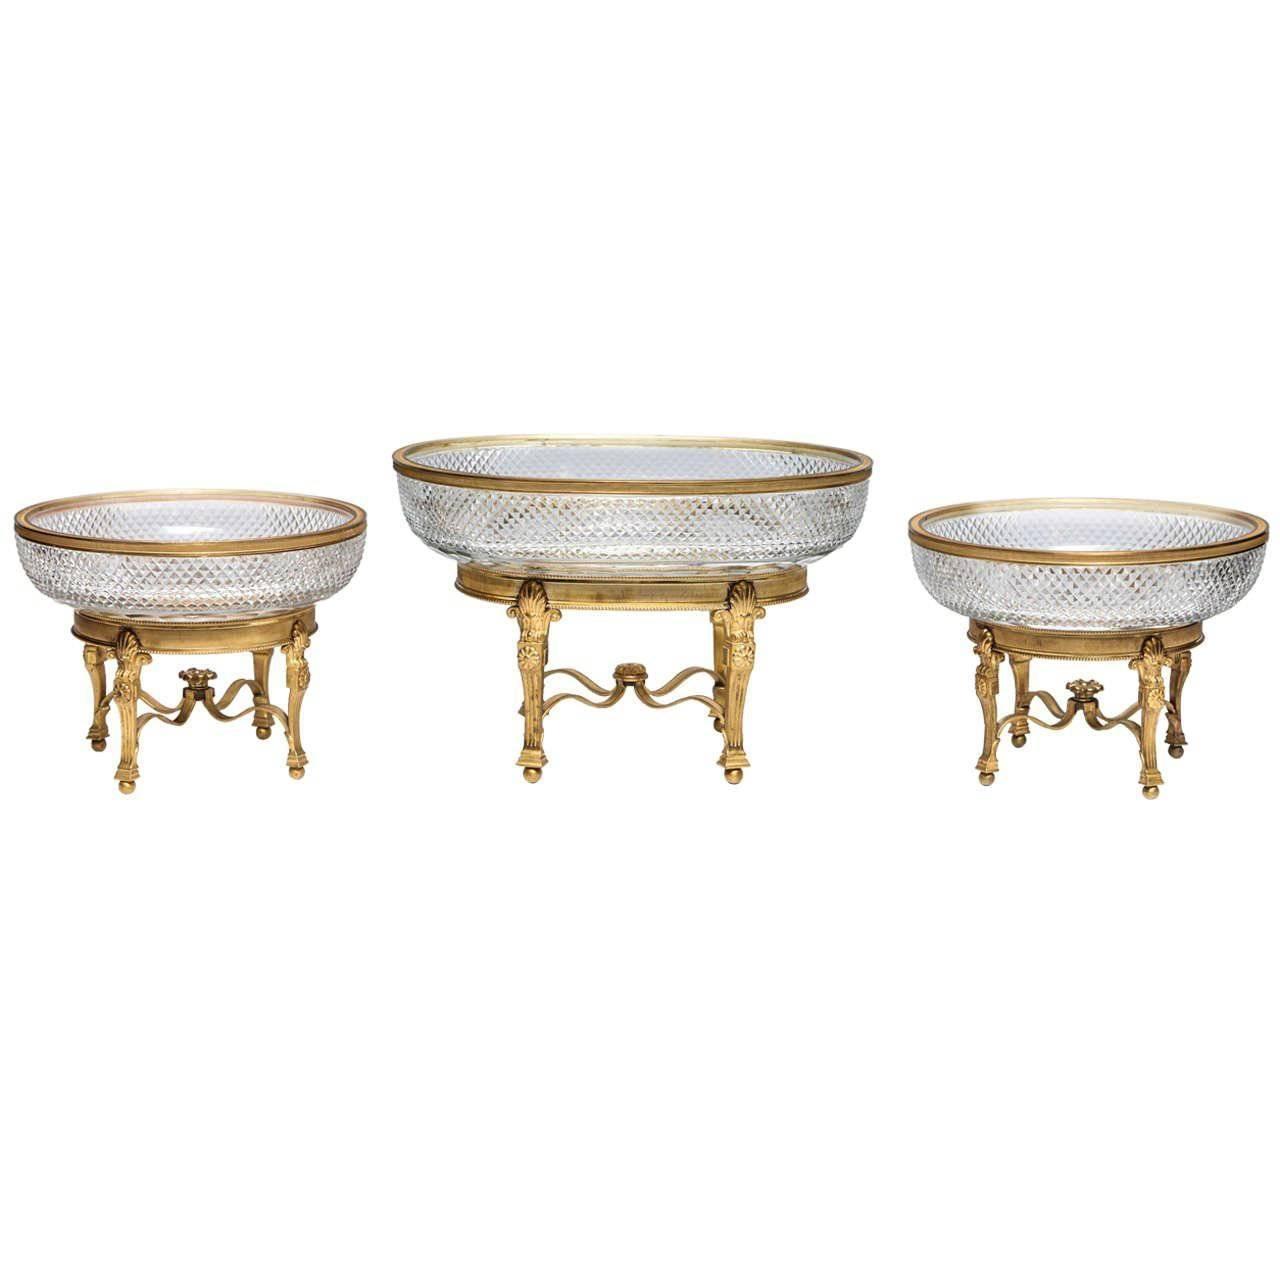 Three-Piece Gilt Bronze Mounted Cut Crystal Centrepiece Garniture Set, Baccarat